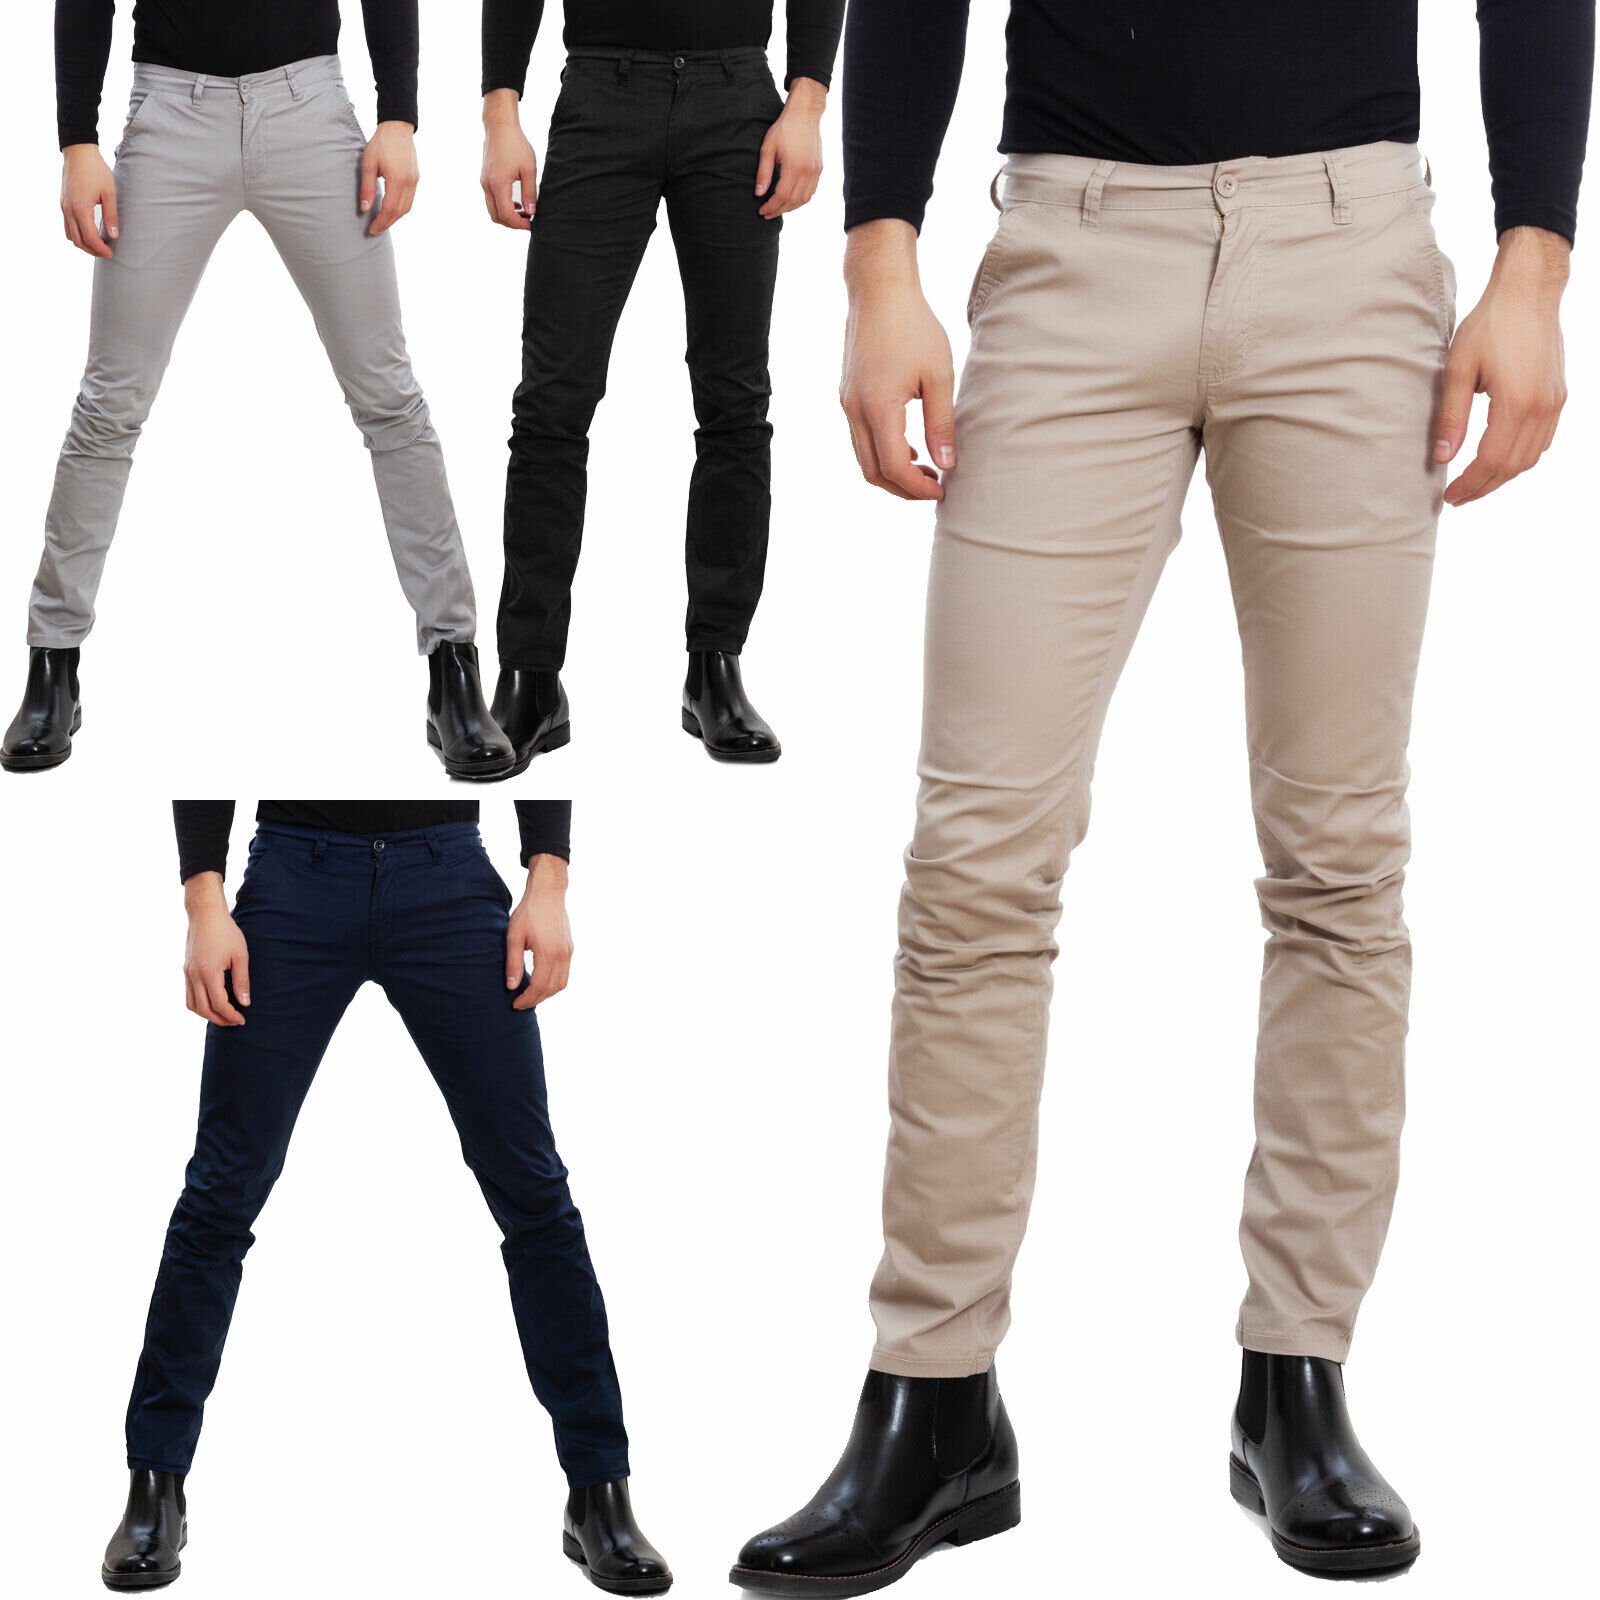 Pantaloni uomo chino cotone casual slim fit basic eleganti regular TOOCOOL E5710